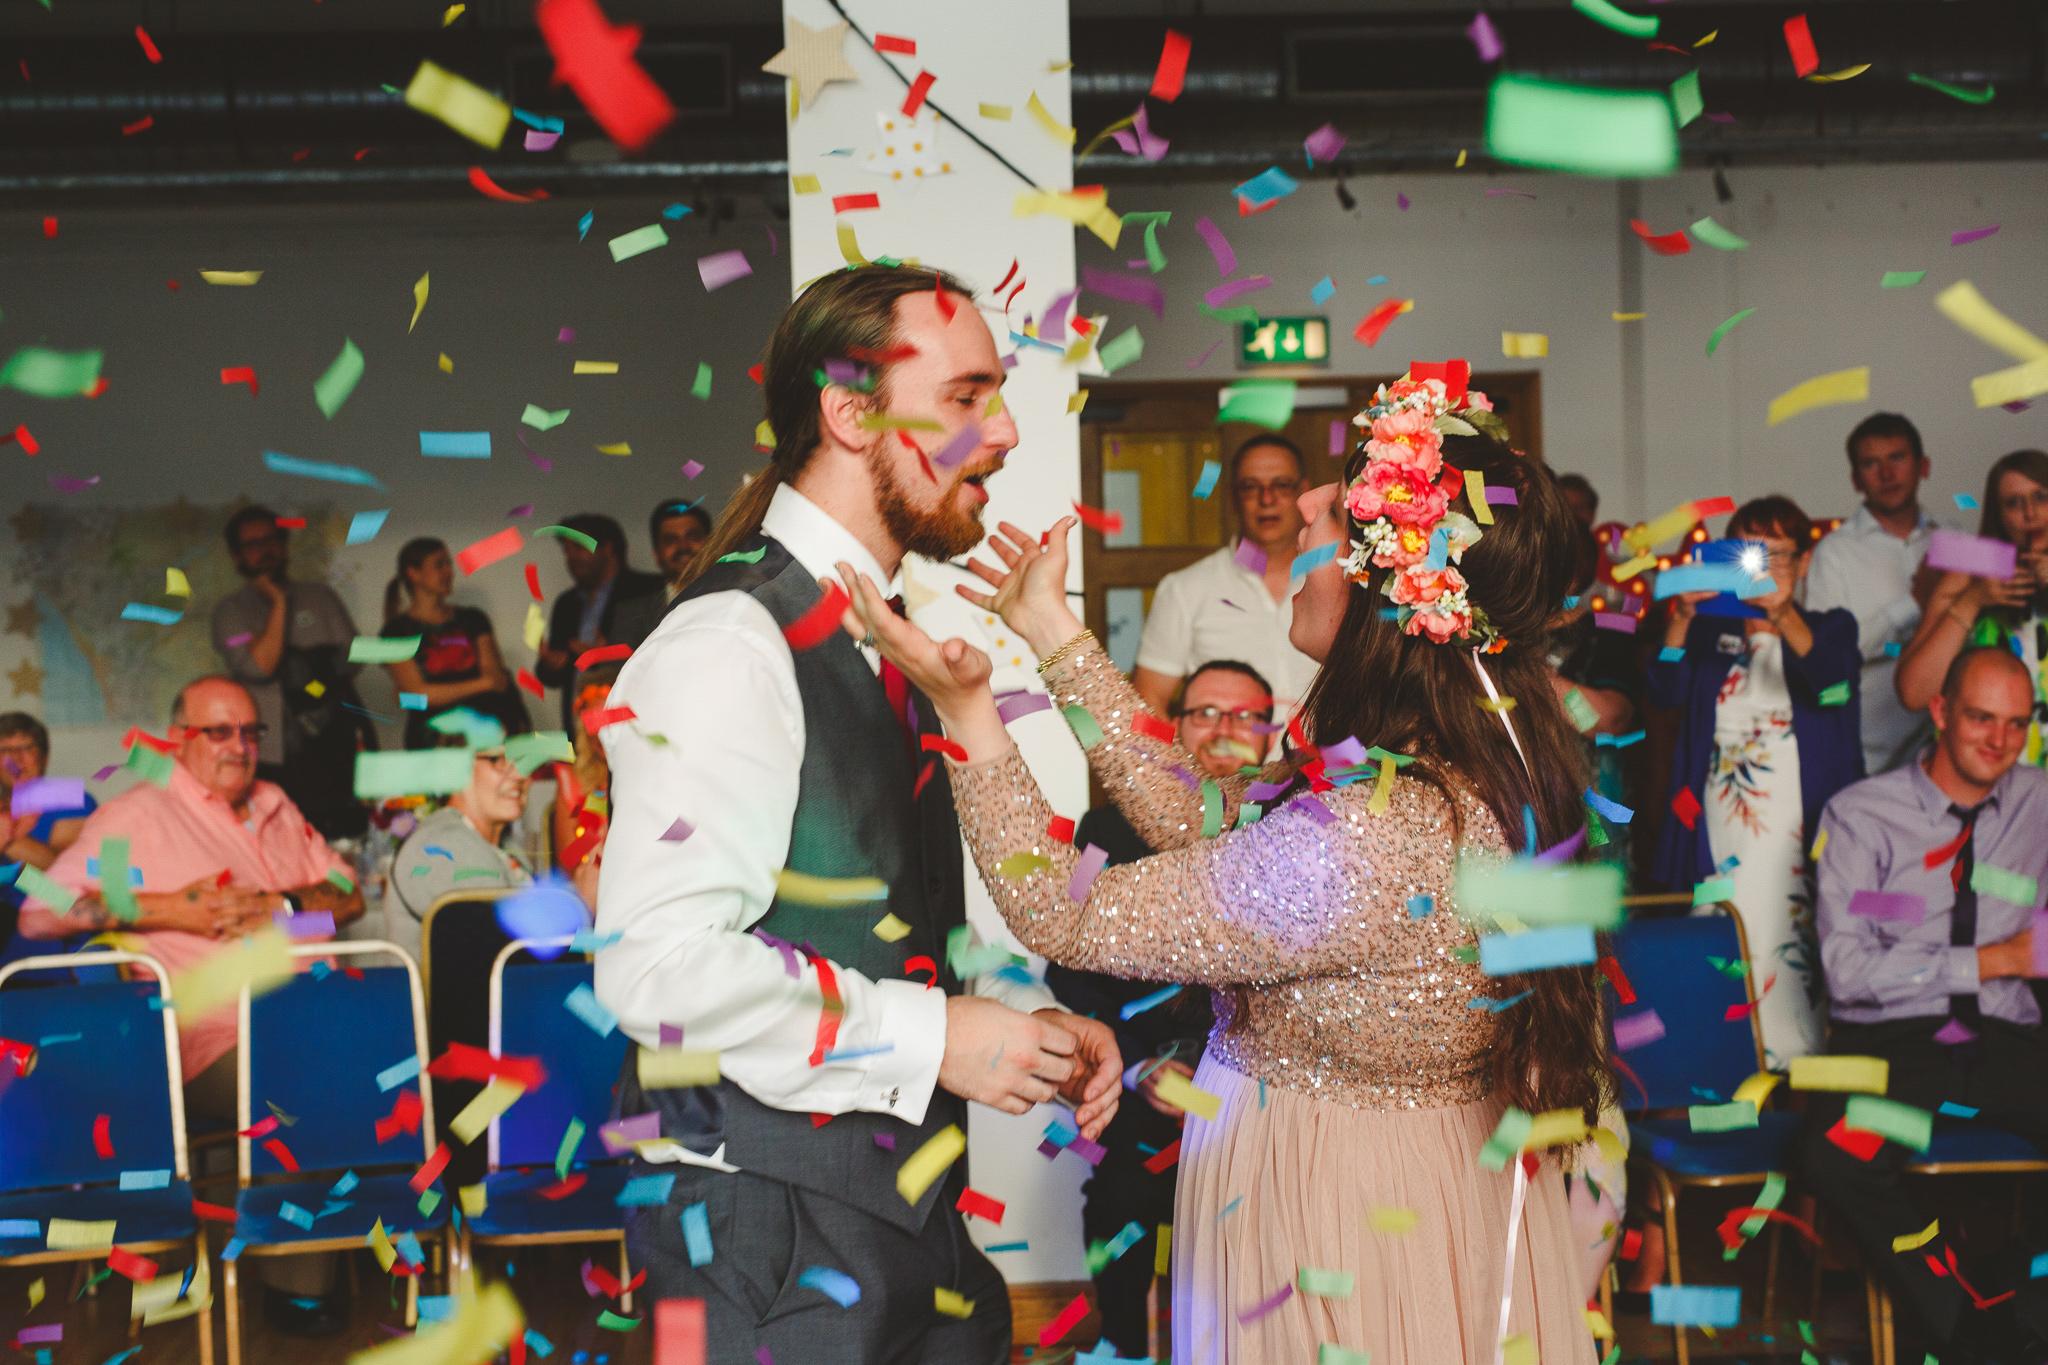 sheffield-wedding-photographer-roxysamblog-43.jpg